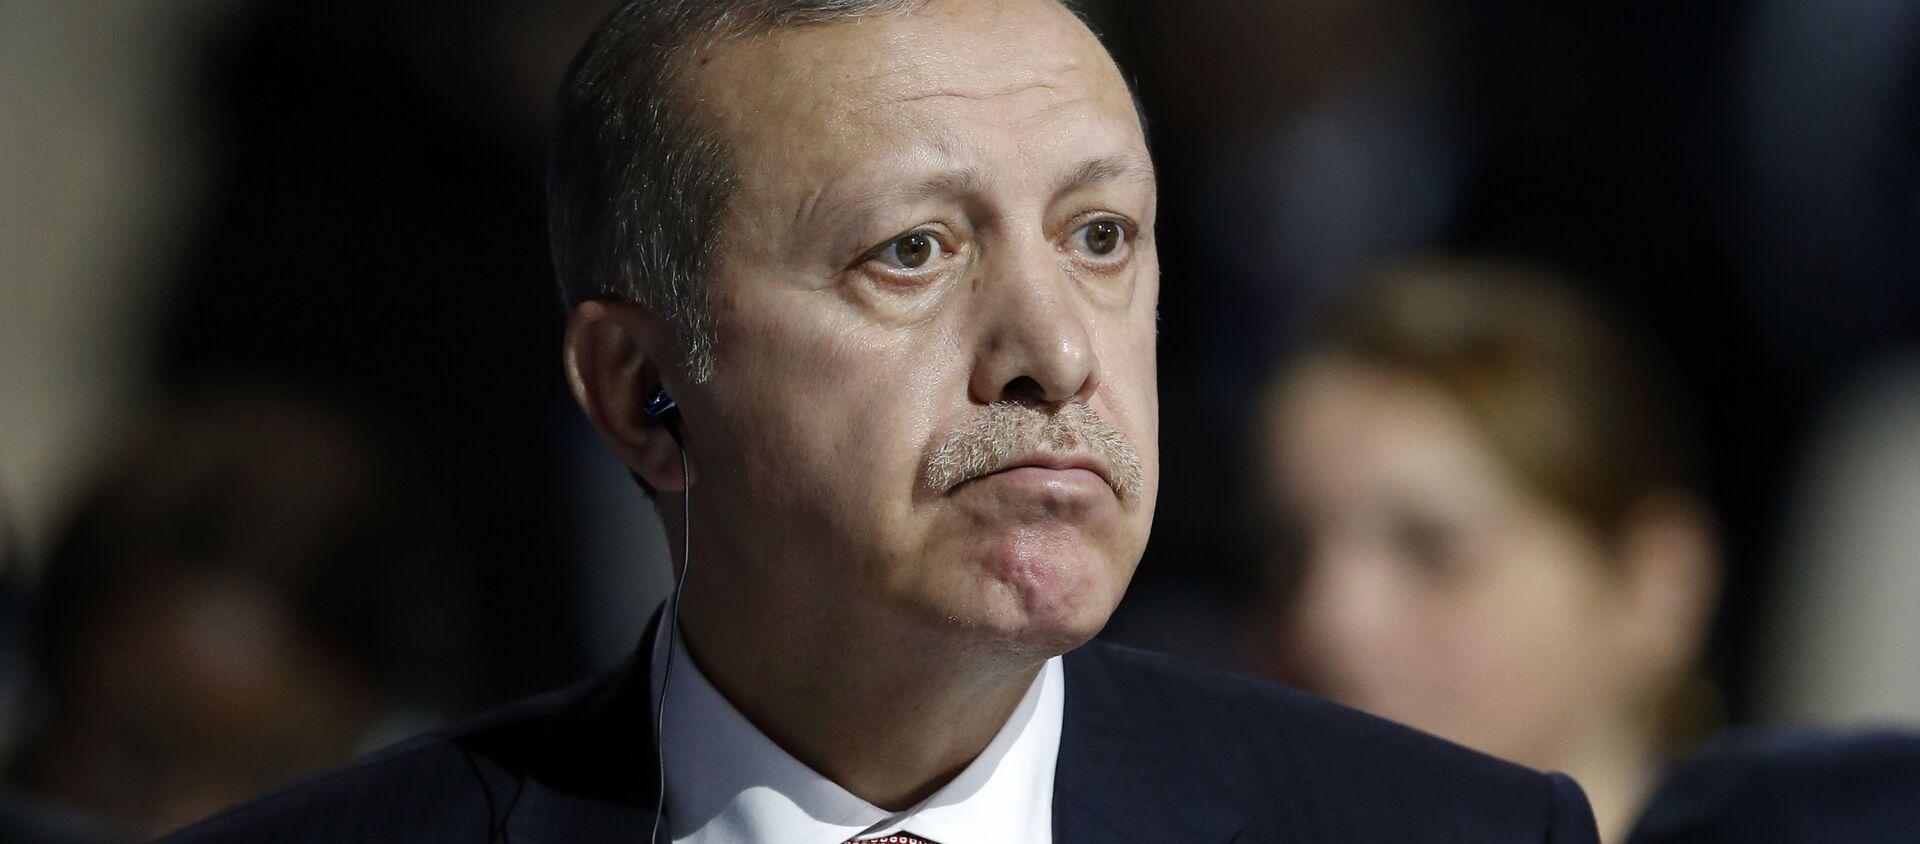 Recep Tayyip Erdogan - Sputnik Italia, 1920, 16.03.2017